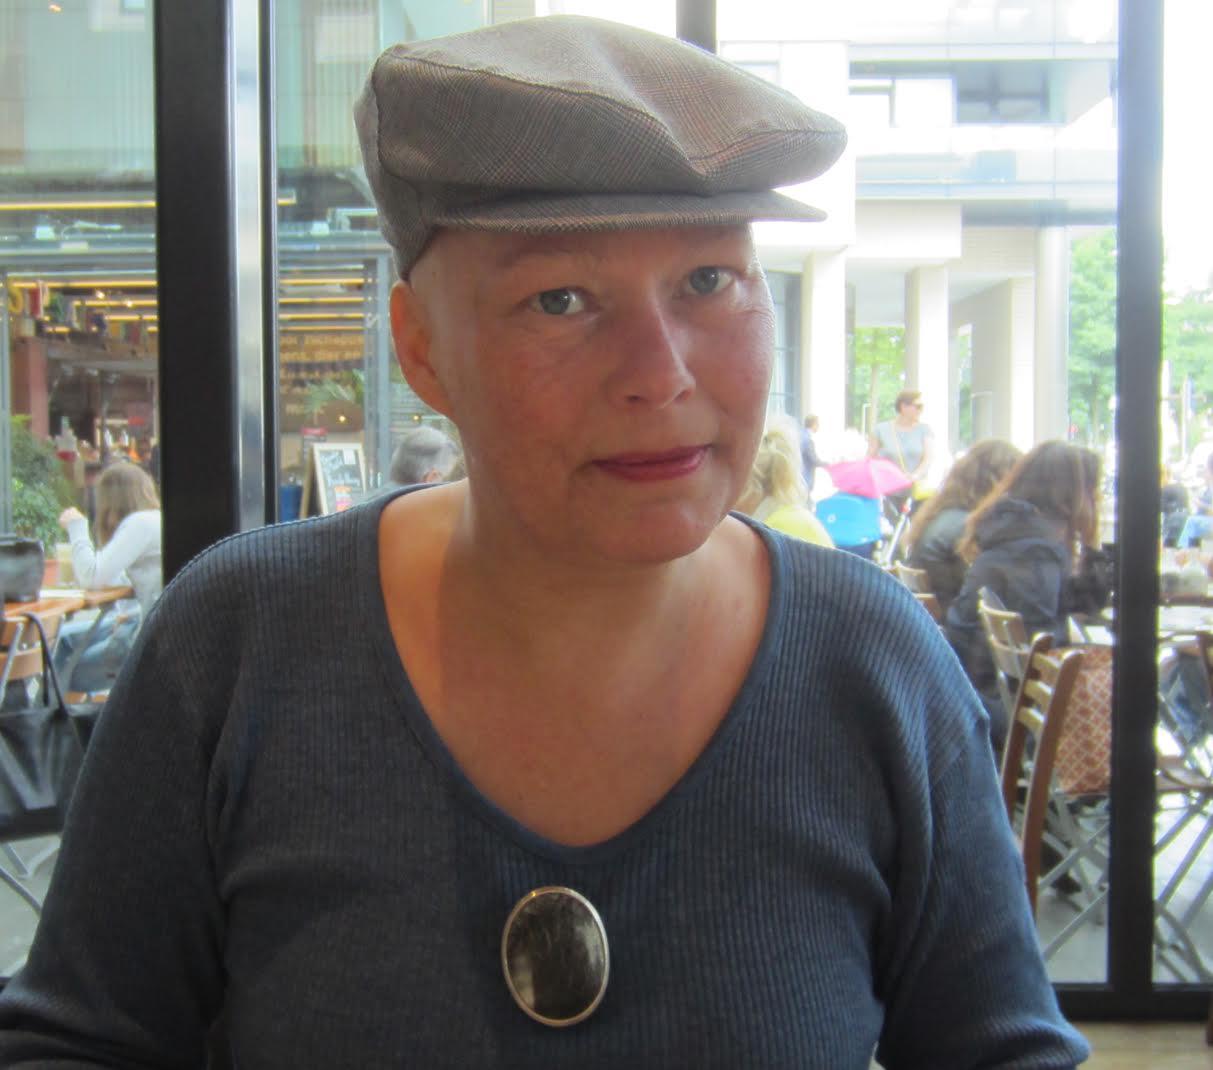 Esther Doornbusch draagt Akihiro Ikeyama, Cow I, broche, Amsterdam, 2017, zilver, koehoorn